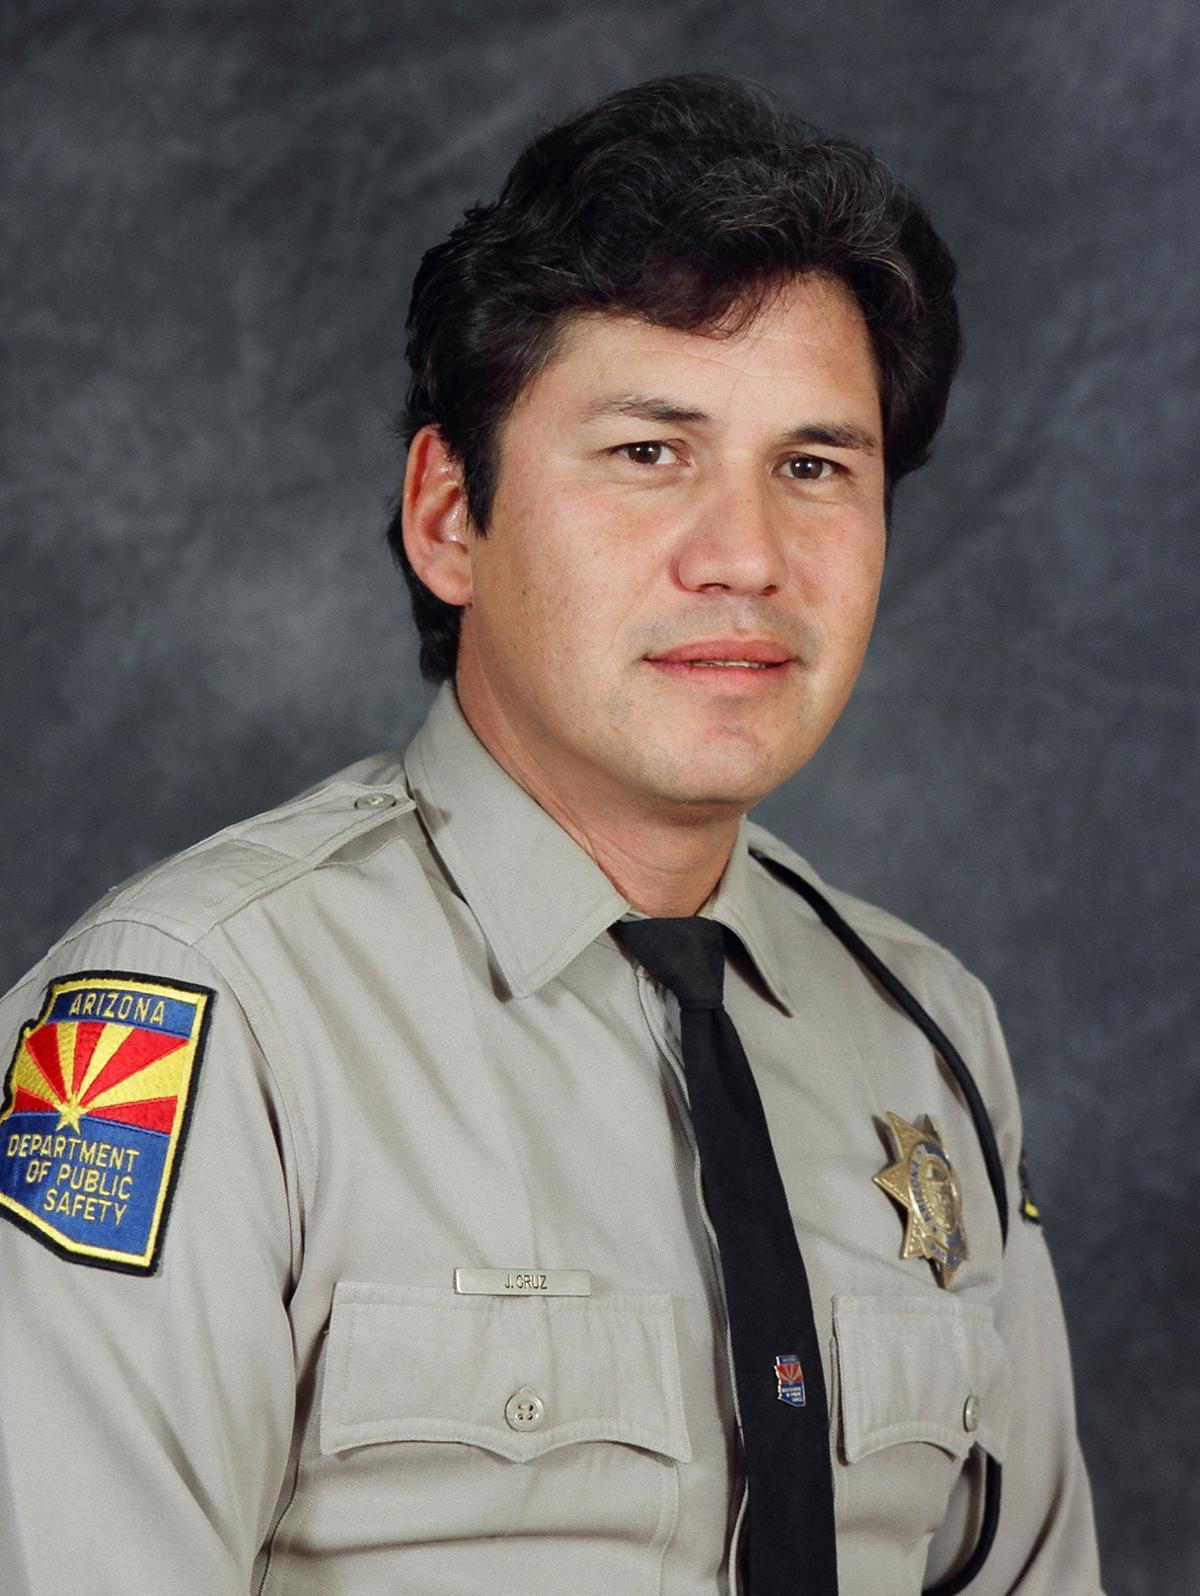 Officer Juan Cruz